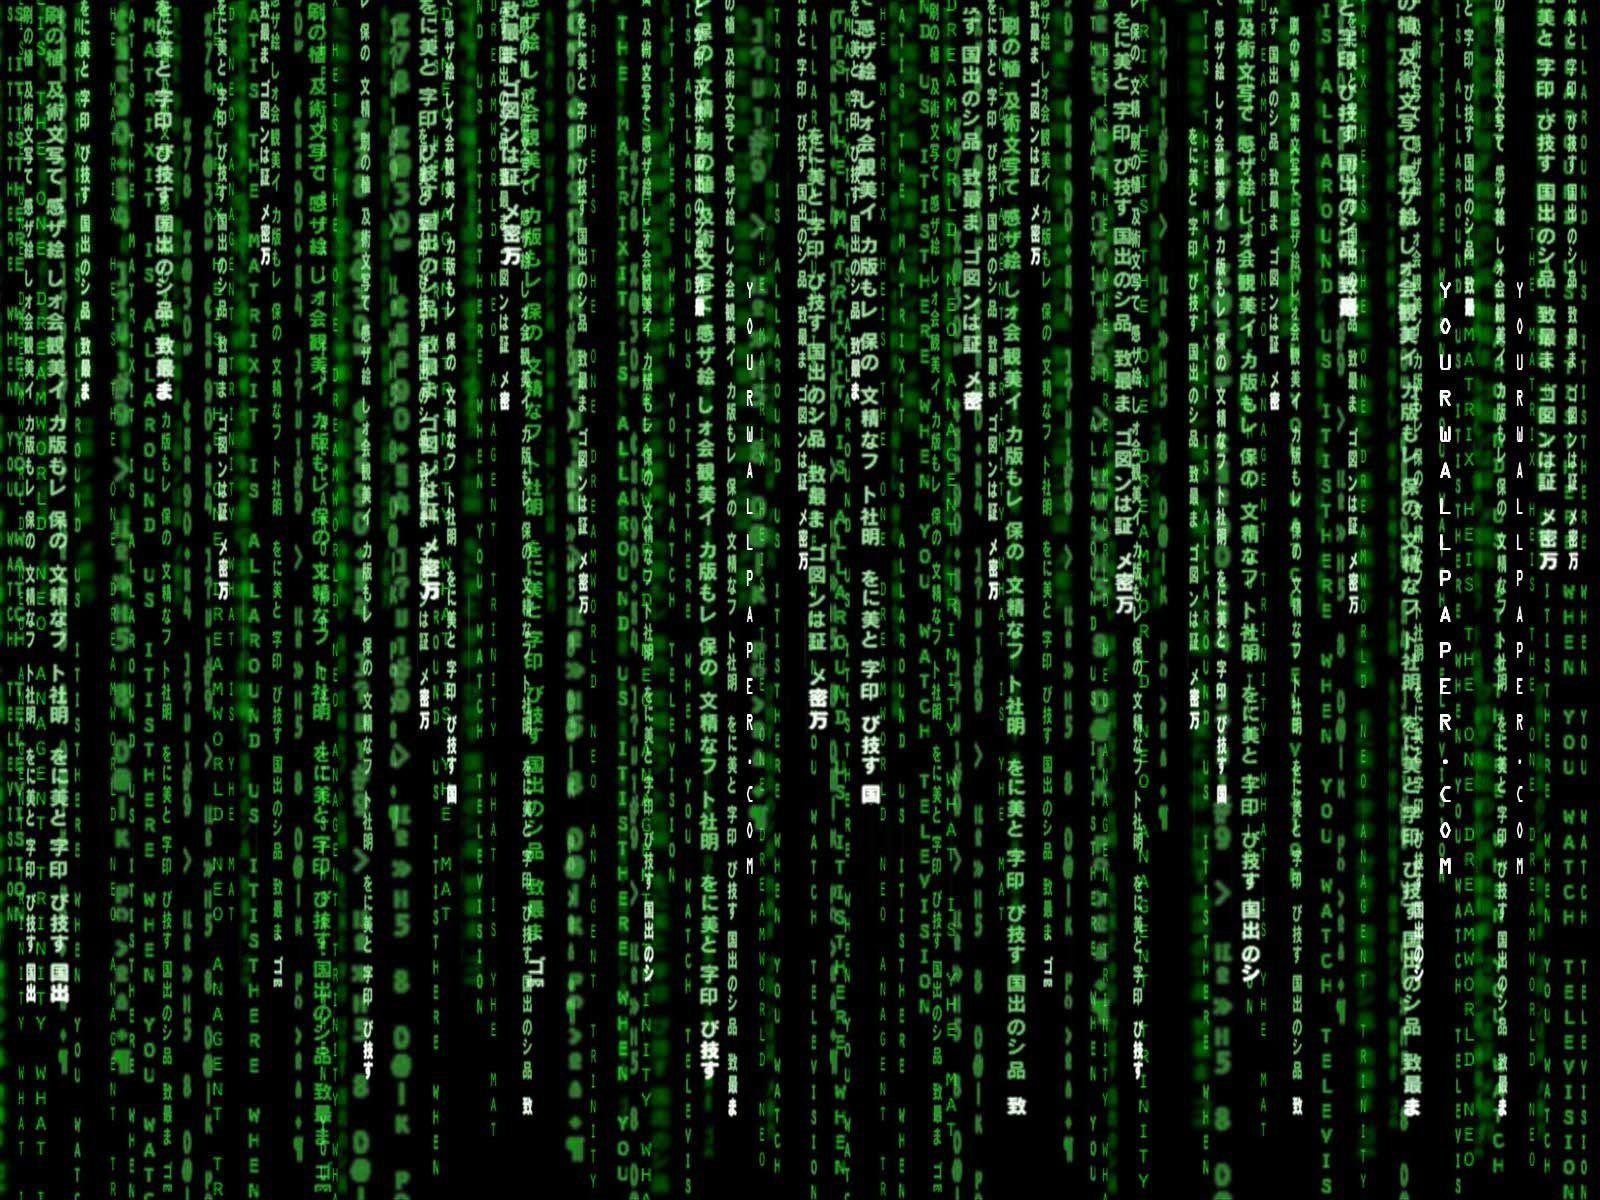 Matrix Movie Wallpapers Wallpaper Hd Wallpapers Pinterest